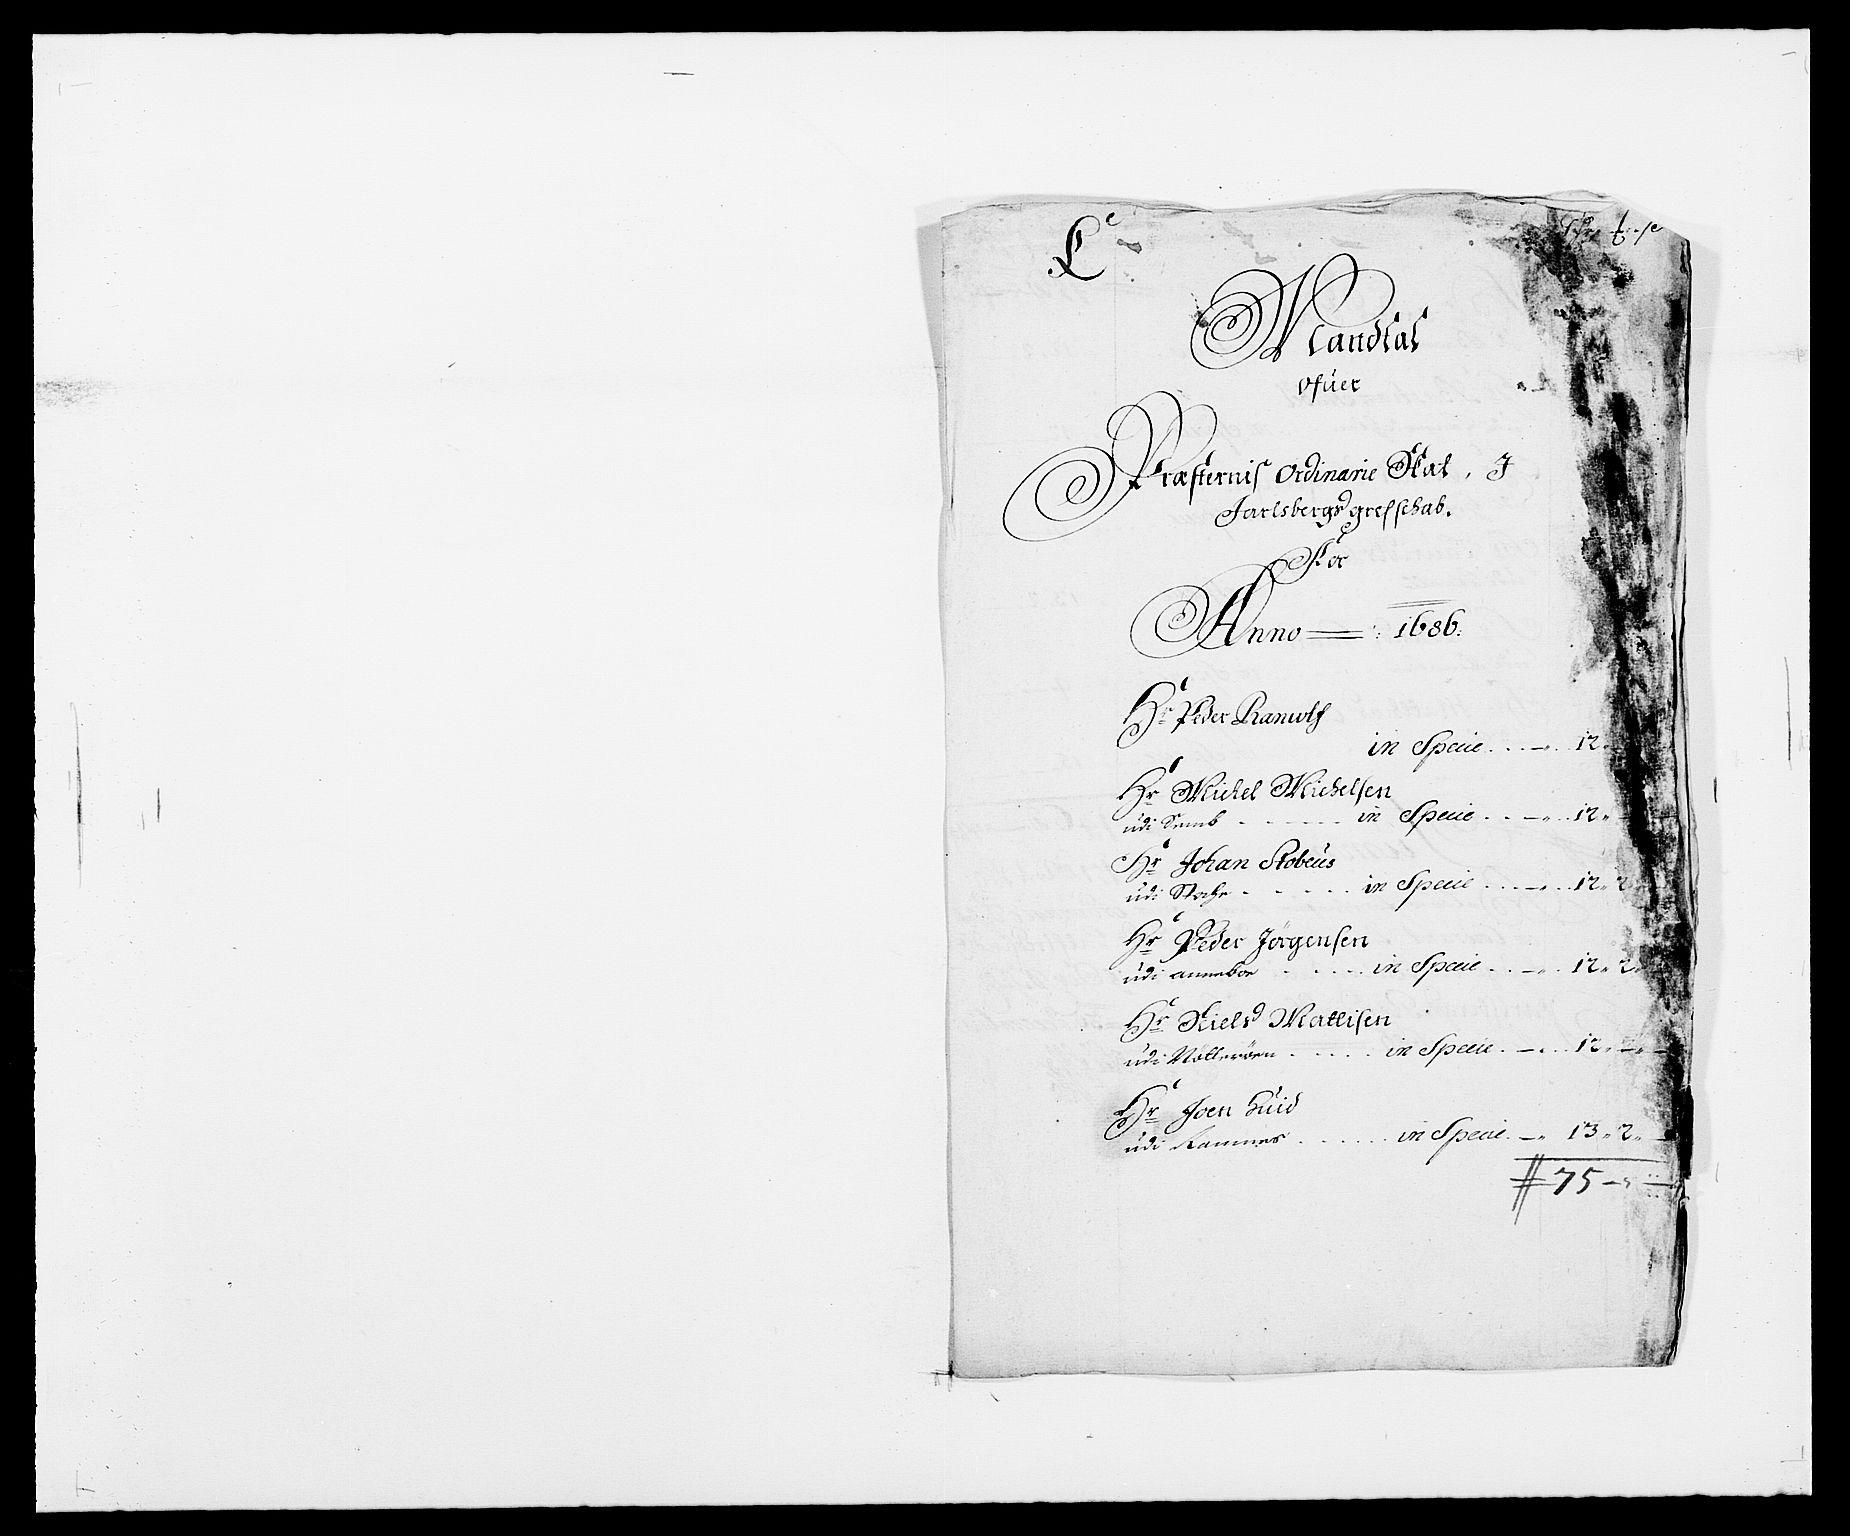 RA, Rentekammeret inntil 1814, Reviderte regnskaper, Fogderegnskap, R32/L1857: Fogderegnskap Jarlsberg grevskap, 1686-1690, s. 412